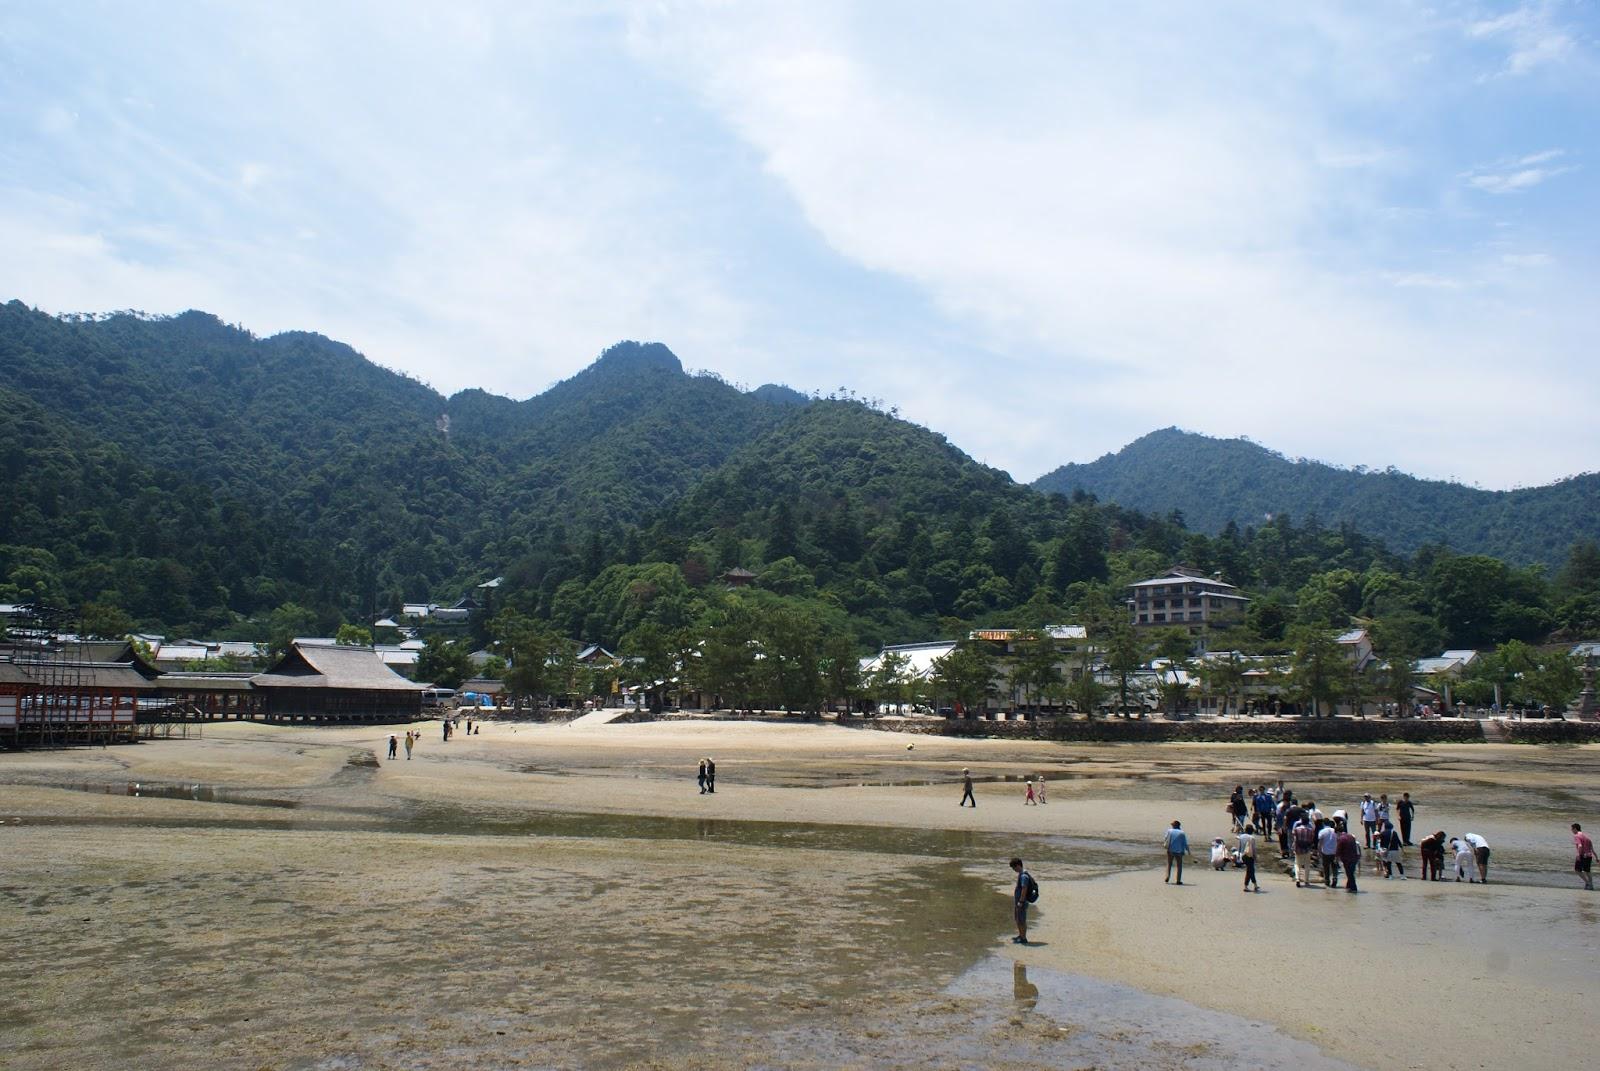 miyajima itsukushima japan